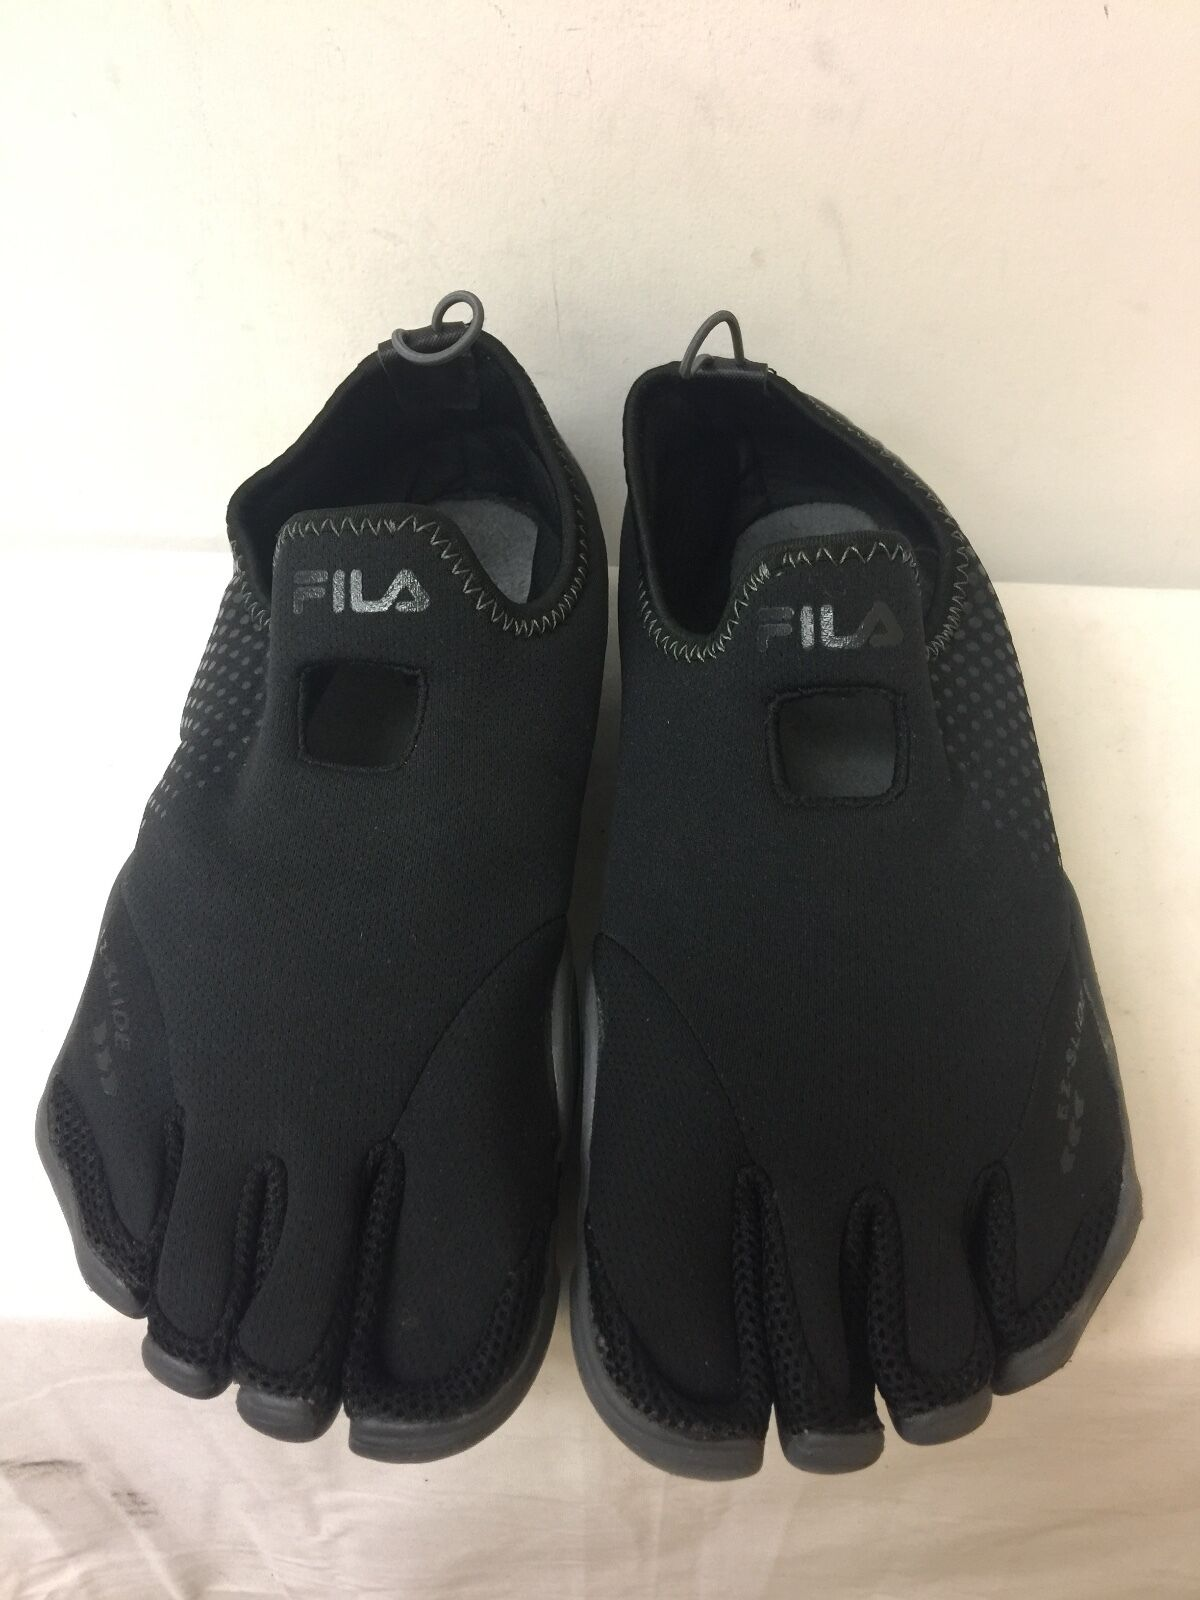 Fila Men black EZ Slide  shoes size US 10 best-selling model of the brand